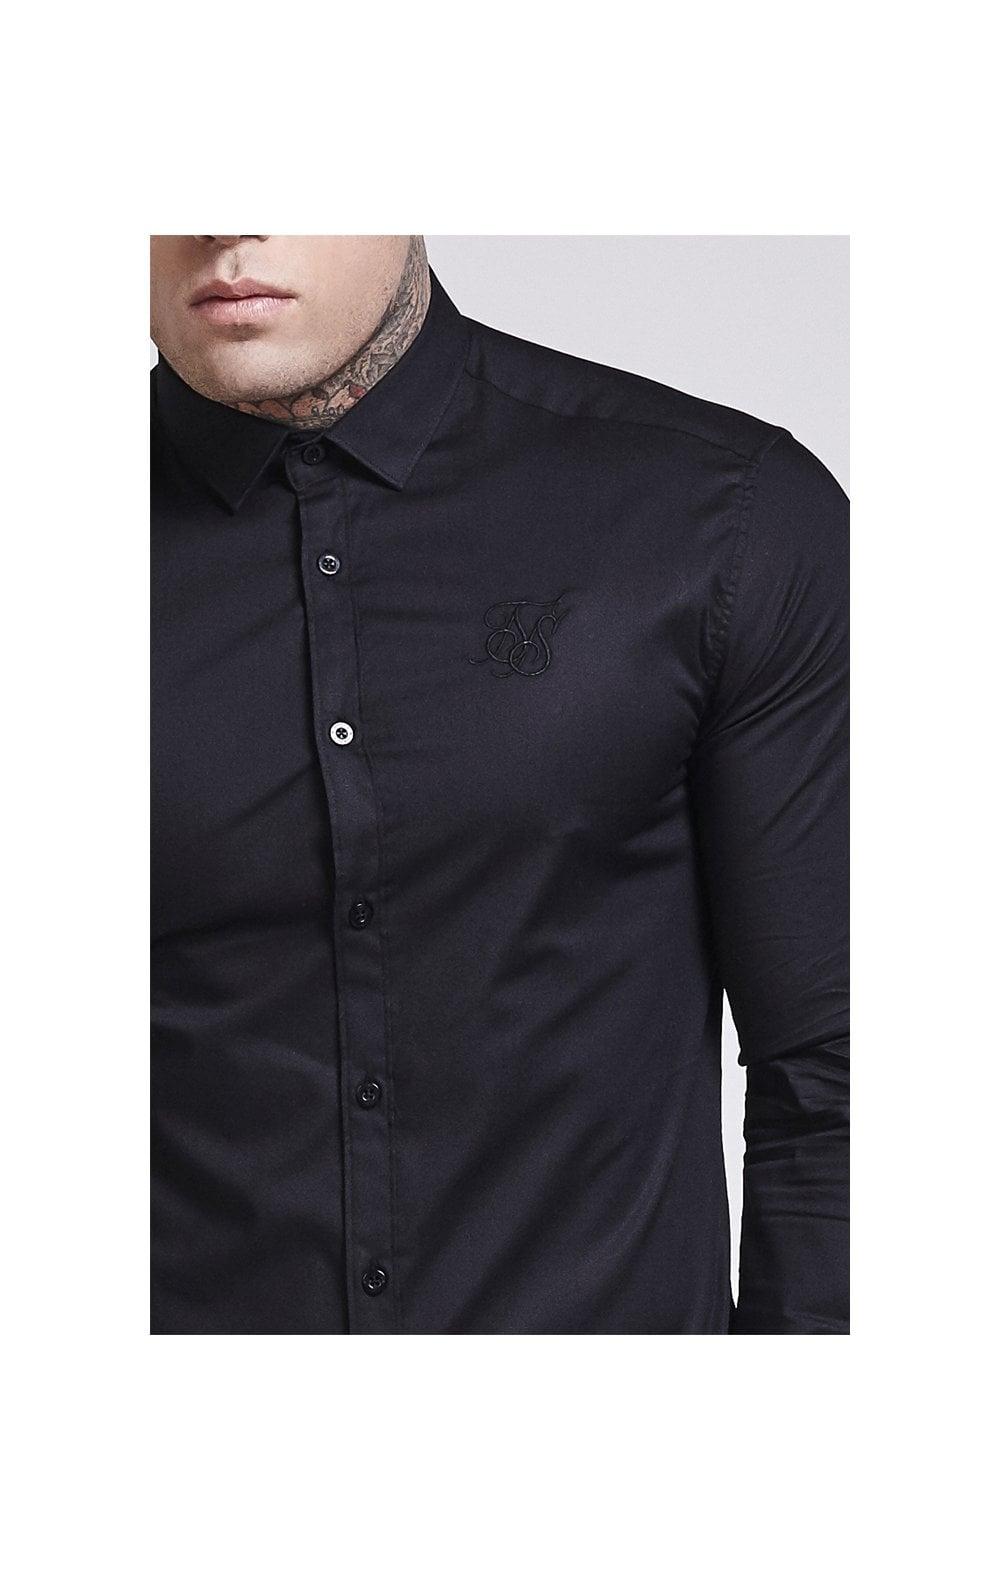 SikSilk Cotton Stretch Shirt - Black MEN SIZES TOP: Small